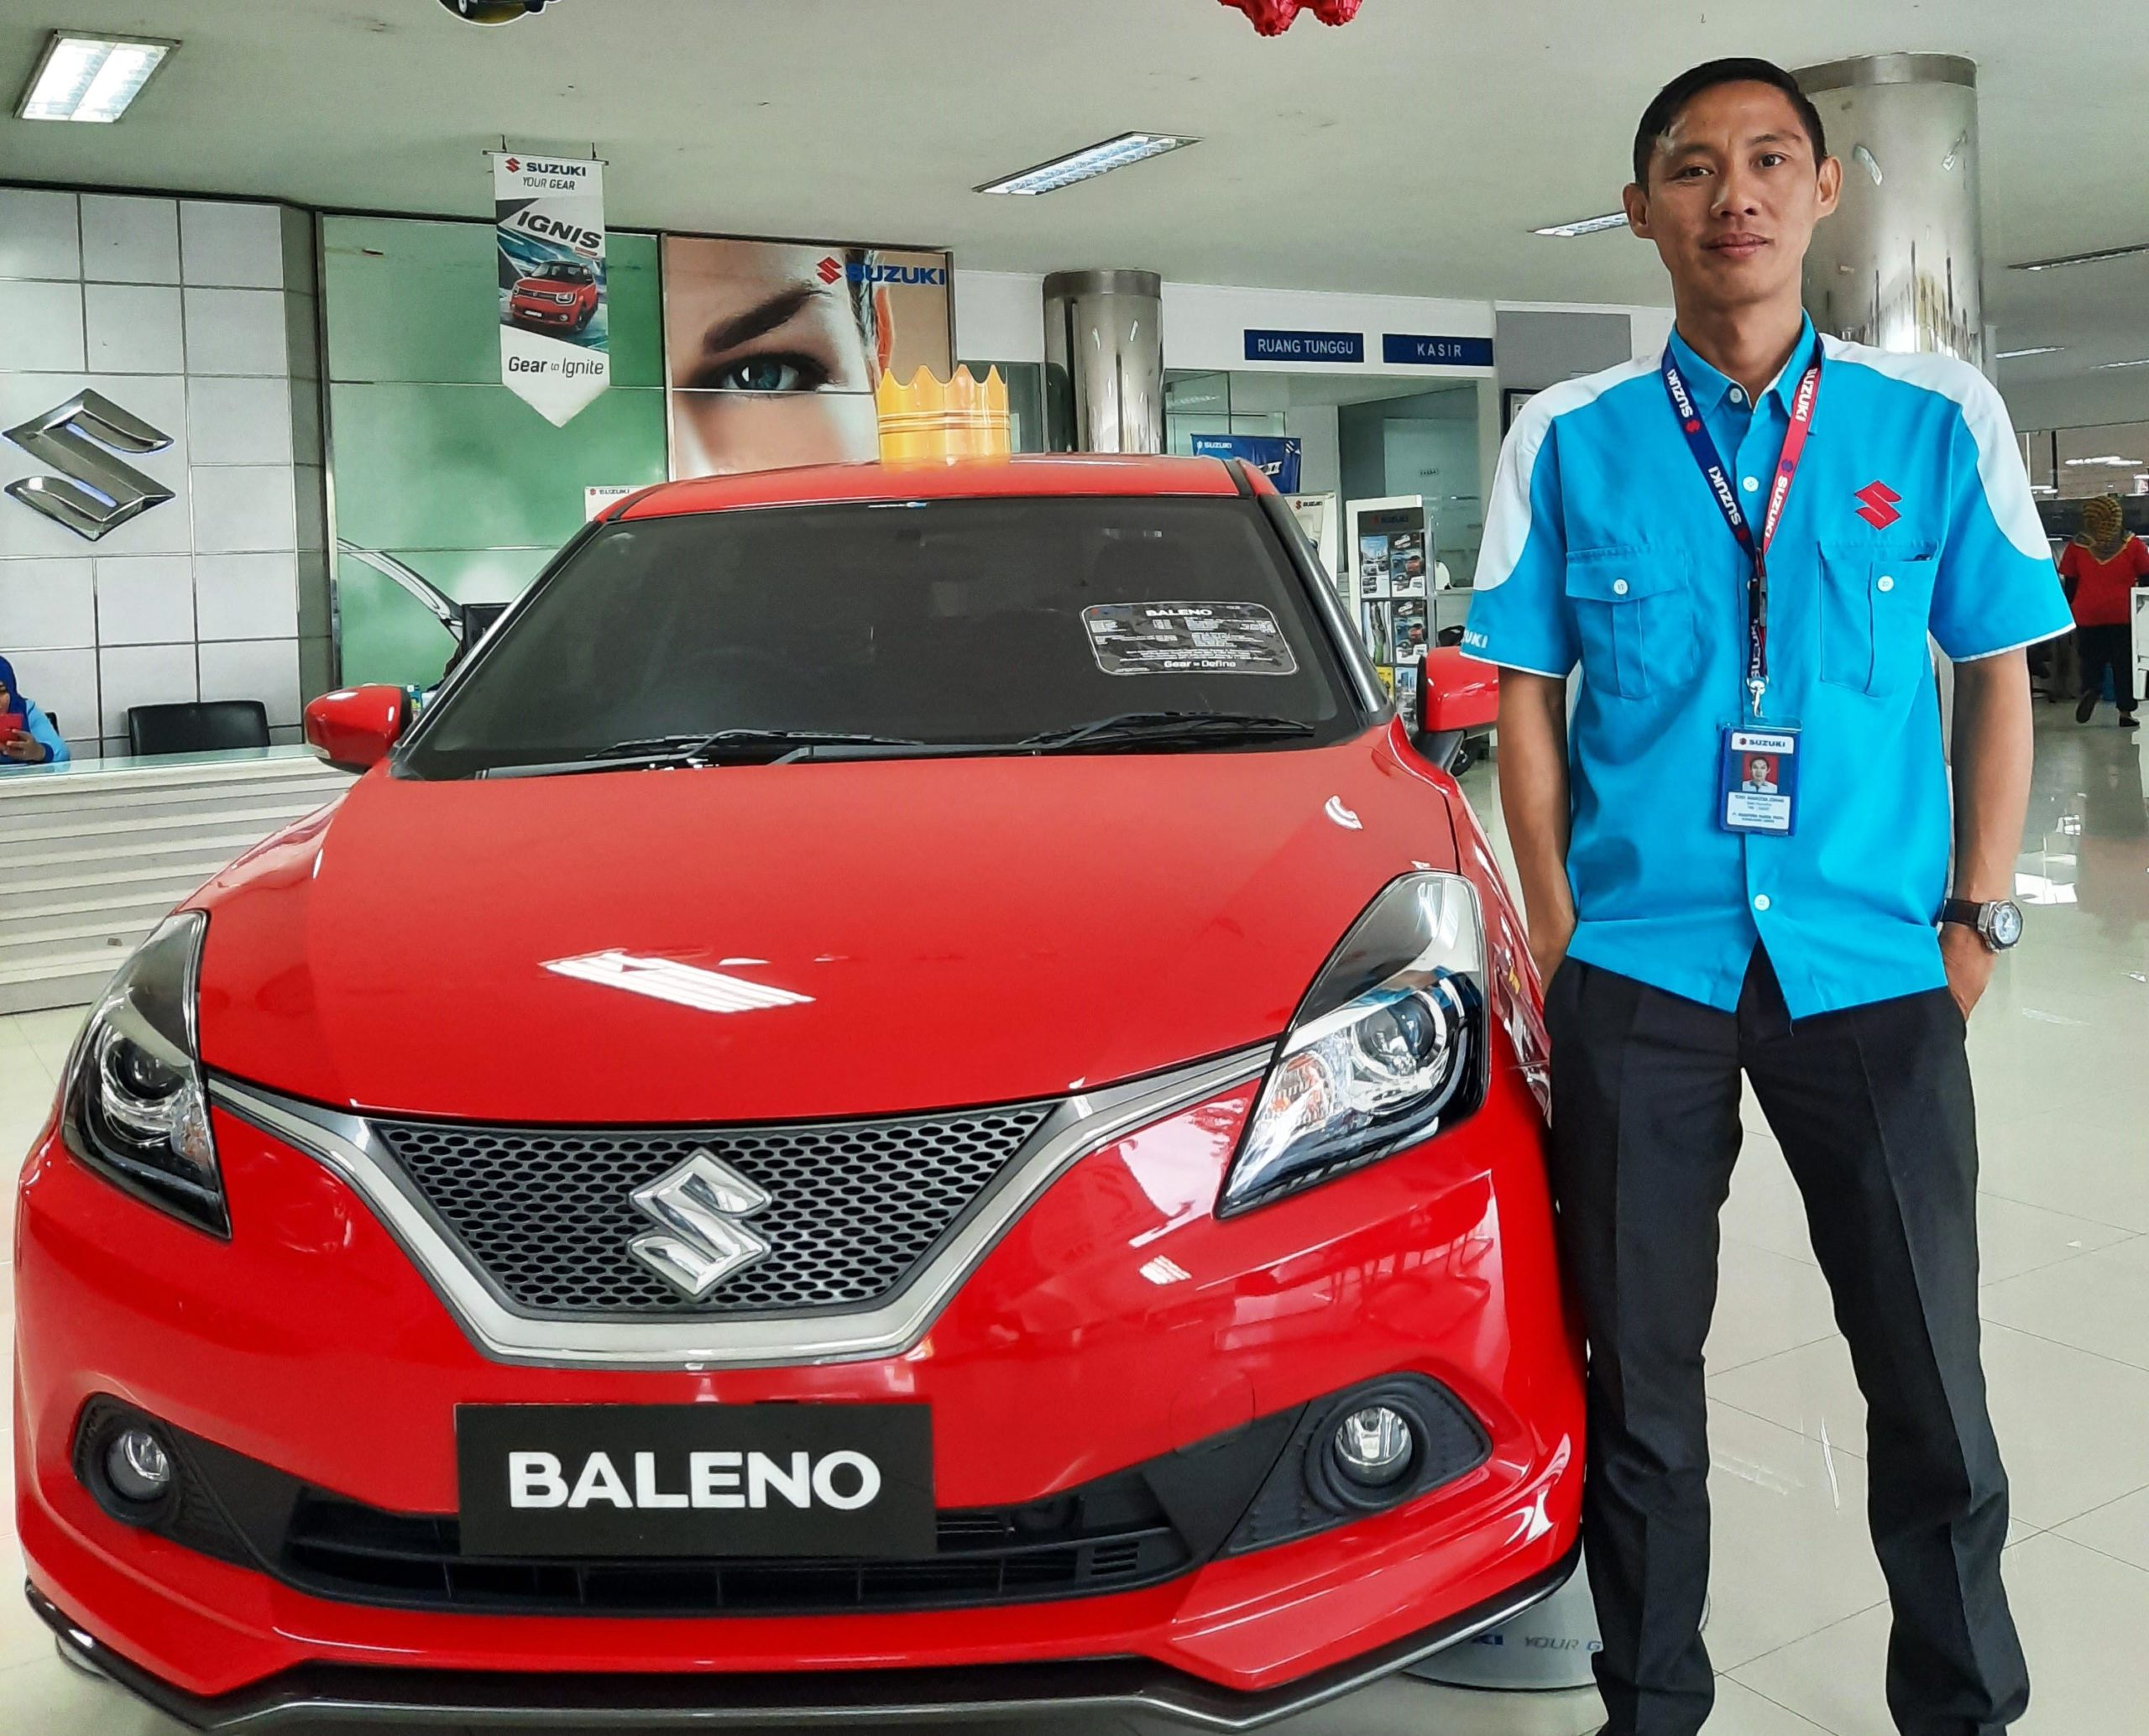 Dealer Suzuki Sunter Jakarta Utara - Harga Promo Kredit Mobil Suzuki Jakarta Terbaru delivery 4 sales sejahtera buana trada suzuki sunter jakarta utara